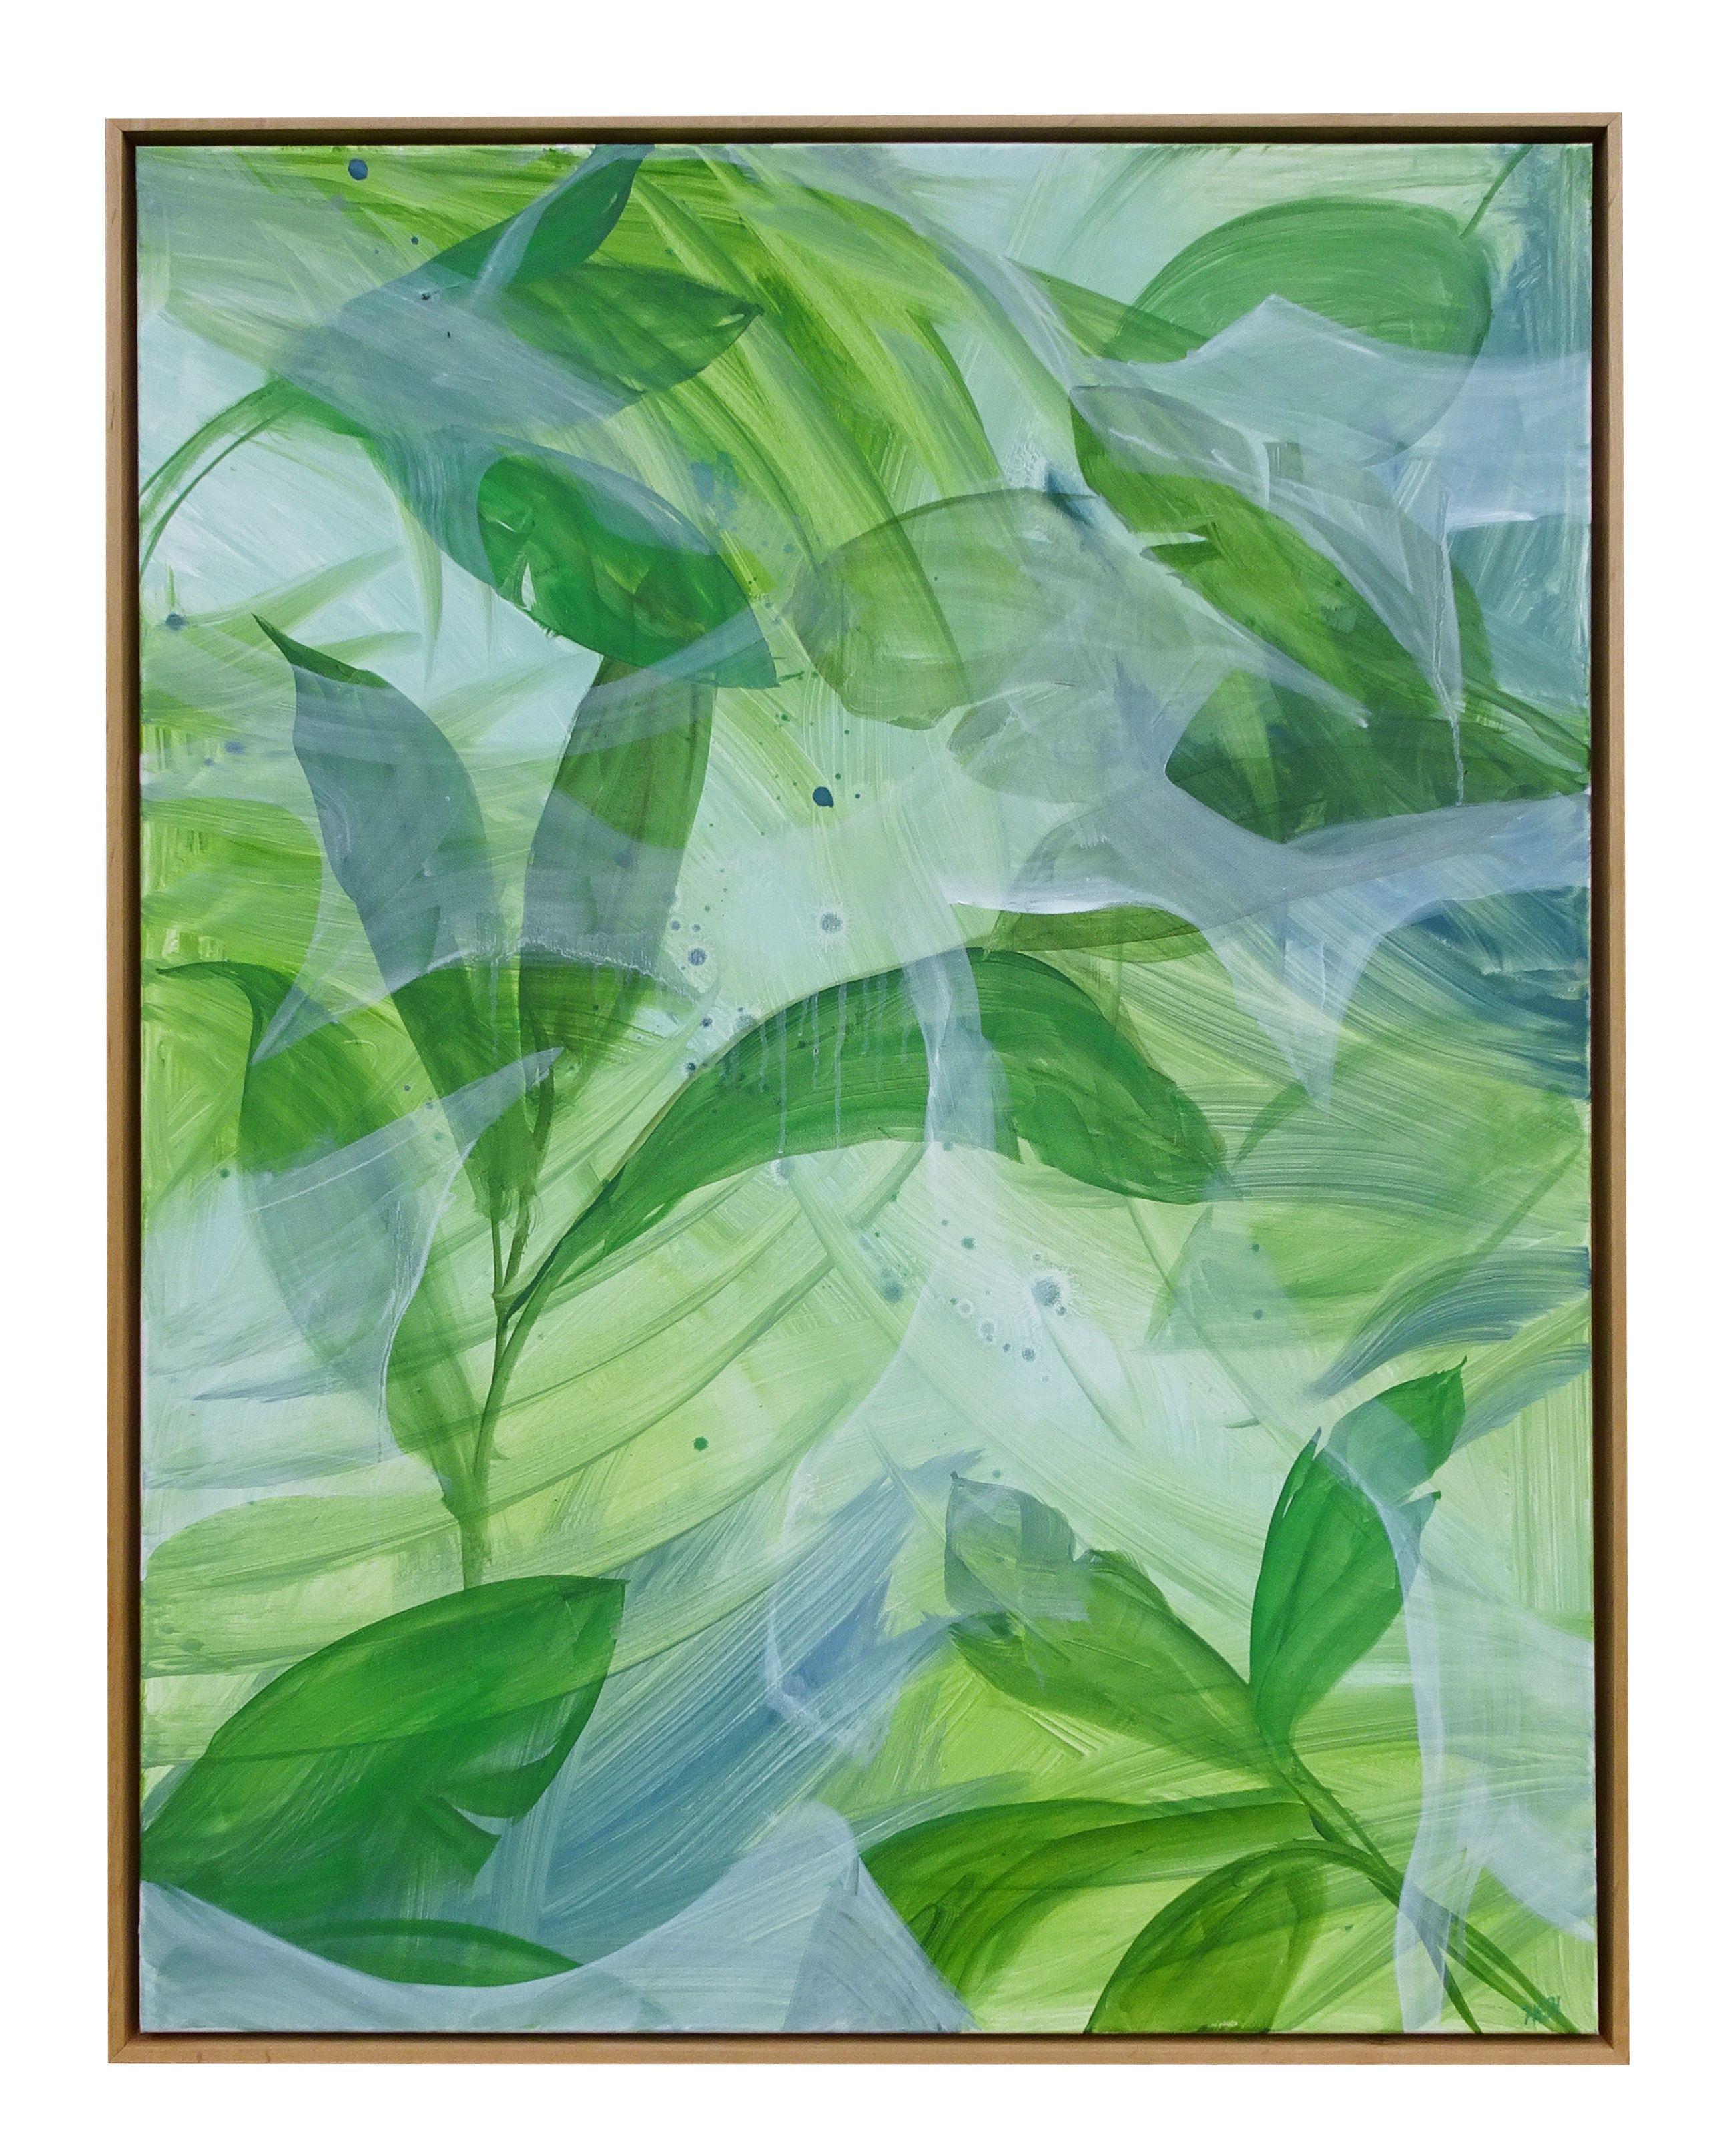 Banana Leaf 30 X 40 Oil On Canvas Framed In Wood Floater